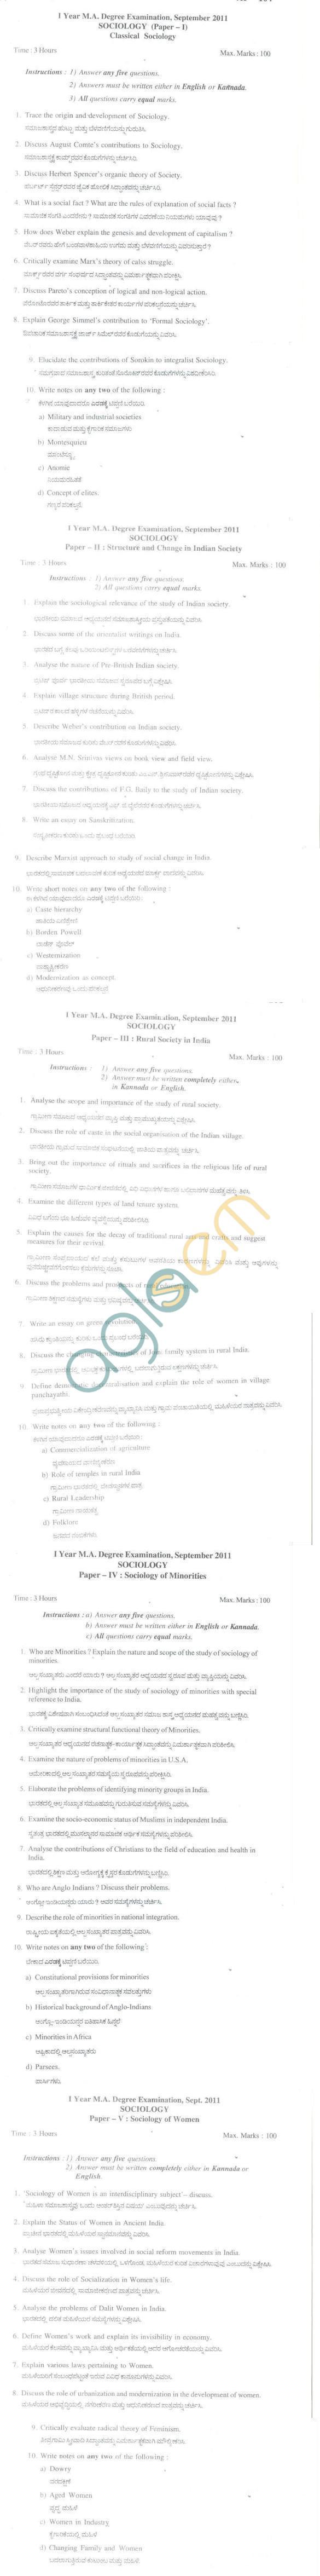 Bangalore University Question Paper September 2011 I Year M.A. Degree Examination - Sociology